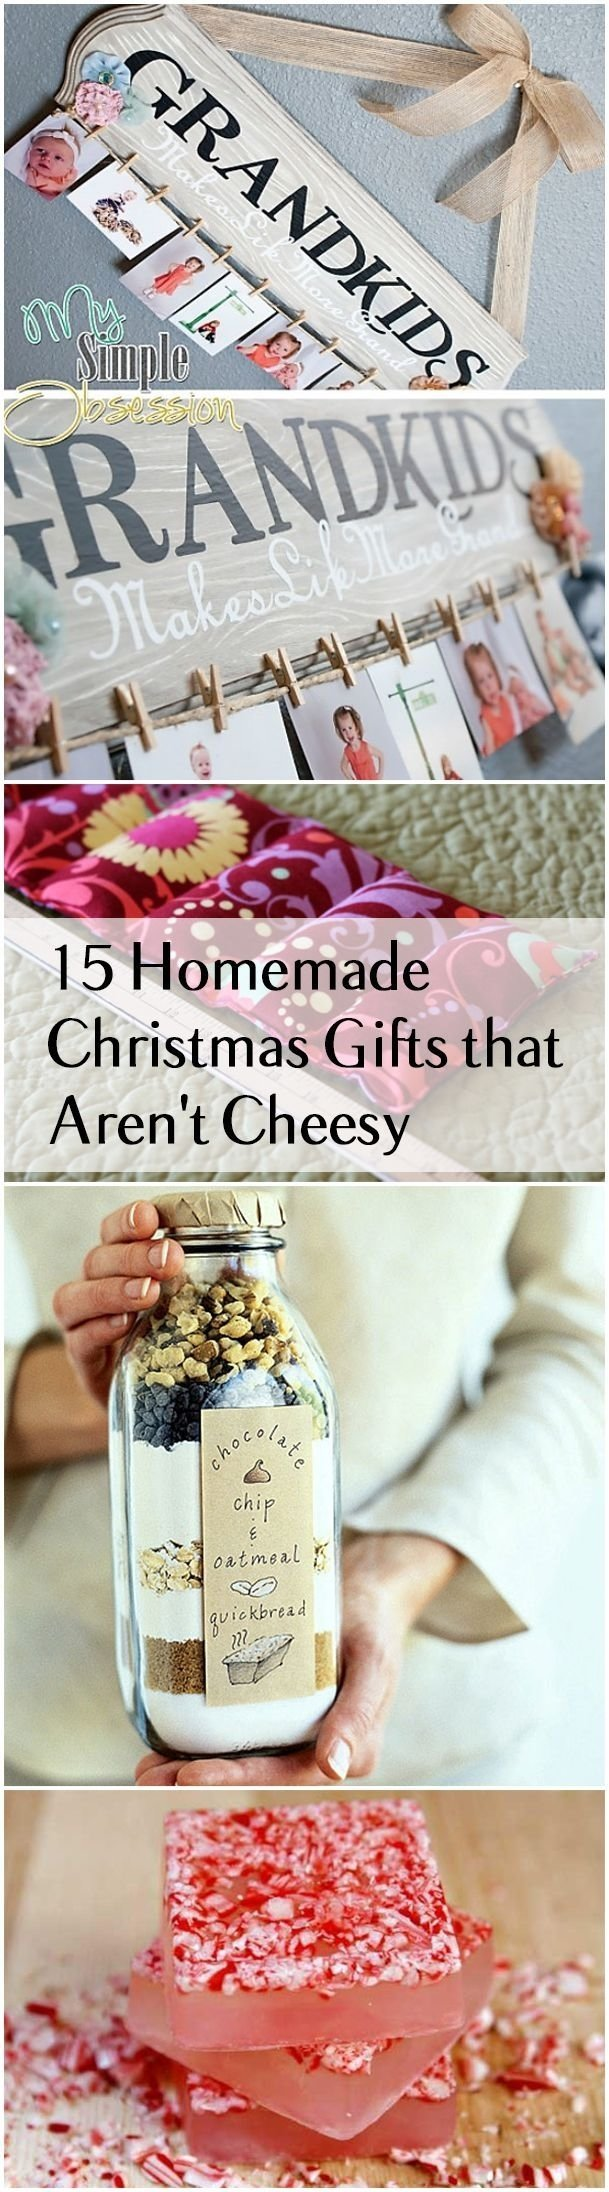 10 Attractive Pinterest Homemade Christmas Gift Ideas 200 best diy christmas gifts images on pinterest gift ideas 5 2021